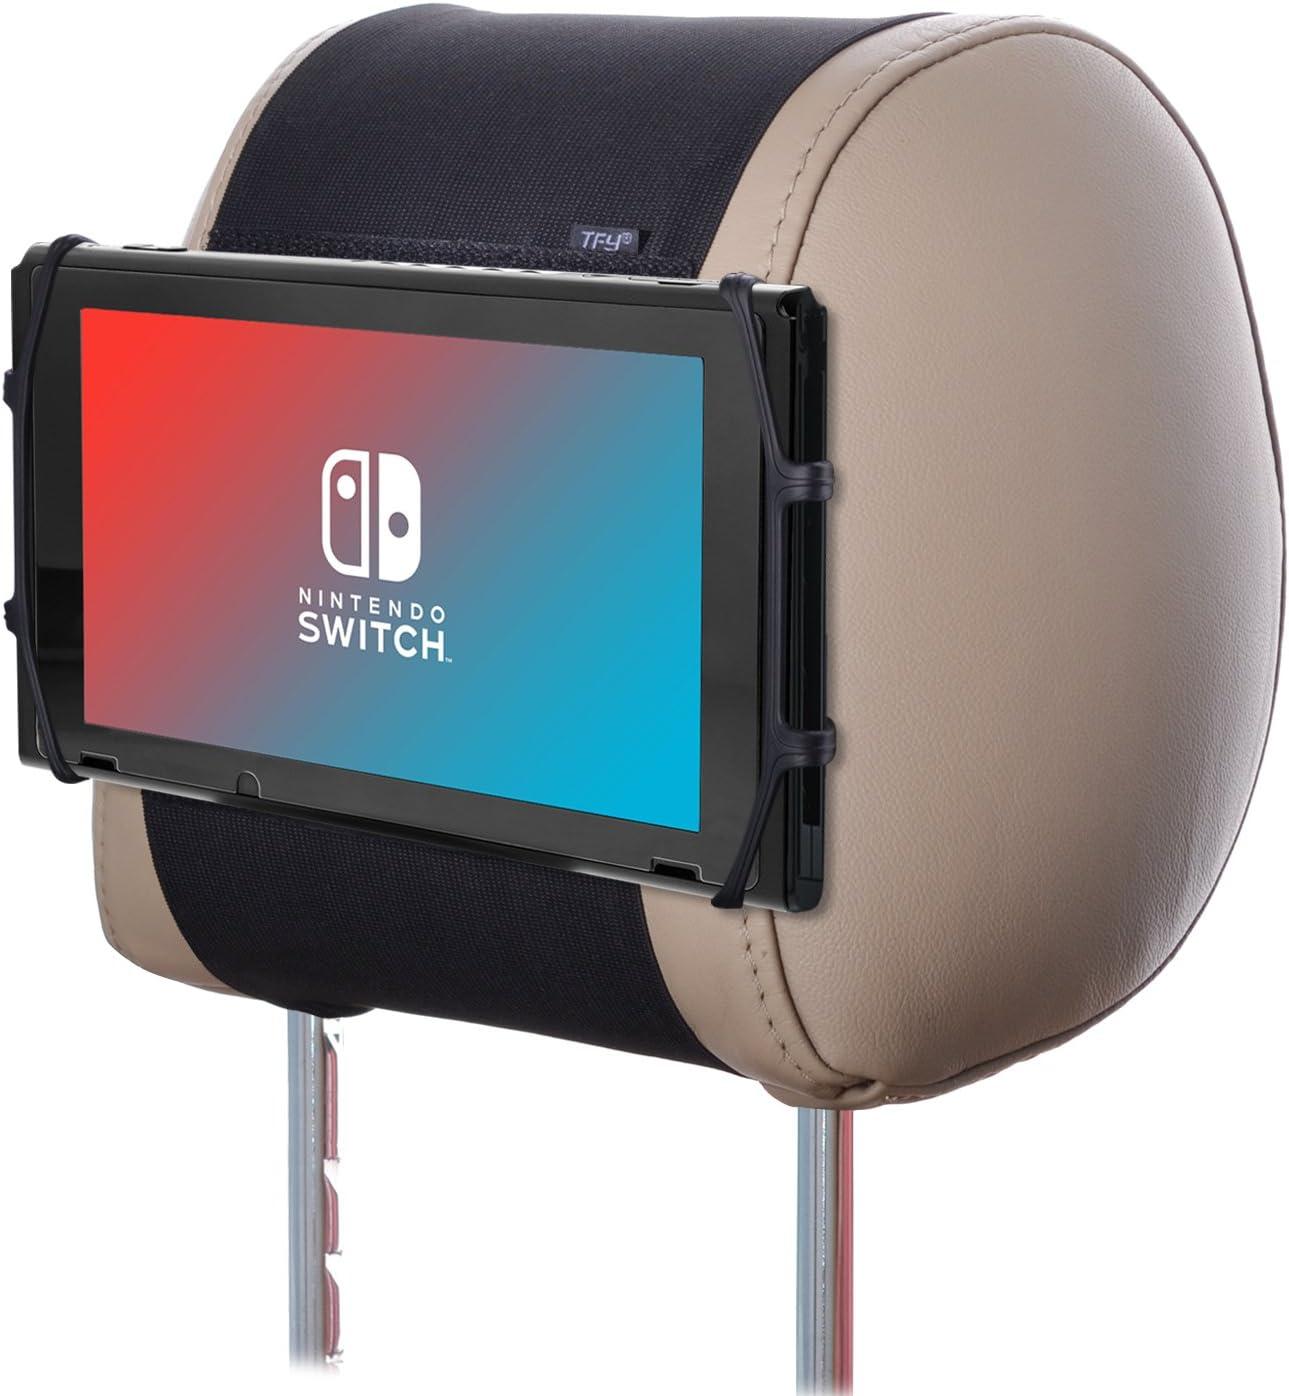 TFY Soporte de Silicona para Reposacabezas del Coche para Nintendo ...